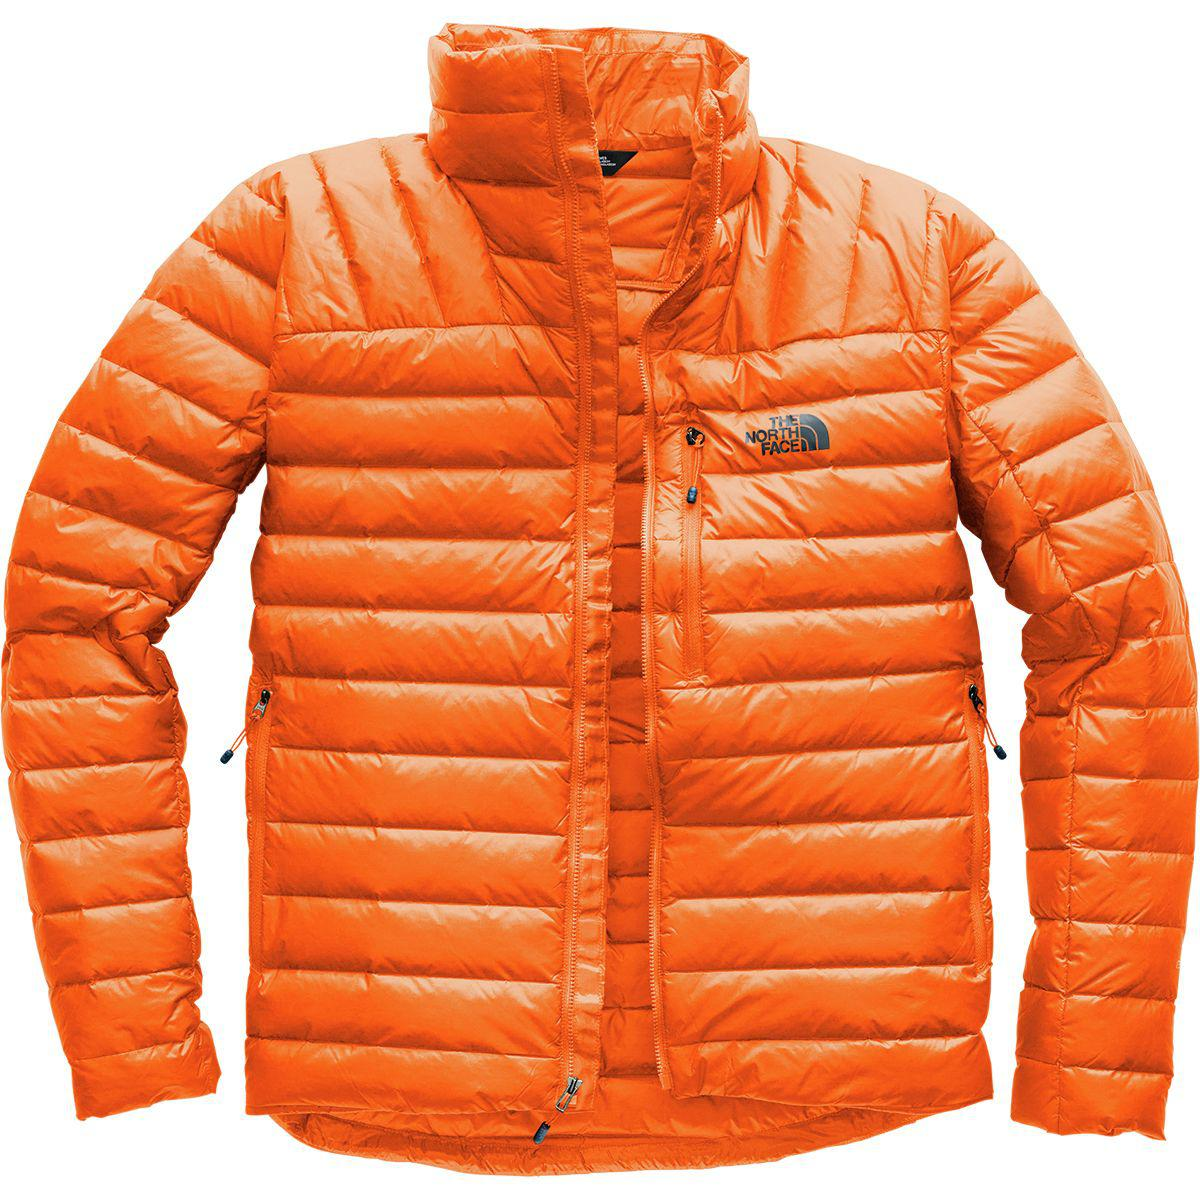 42990de979e4 Lyst - The North Face Morph Down Jacket in Orange for Men - Save 36%